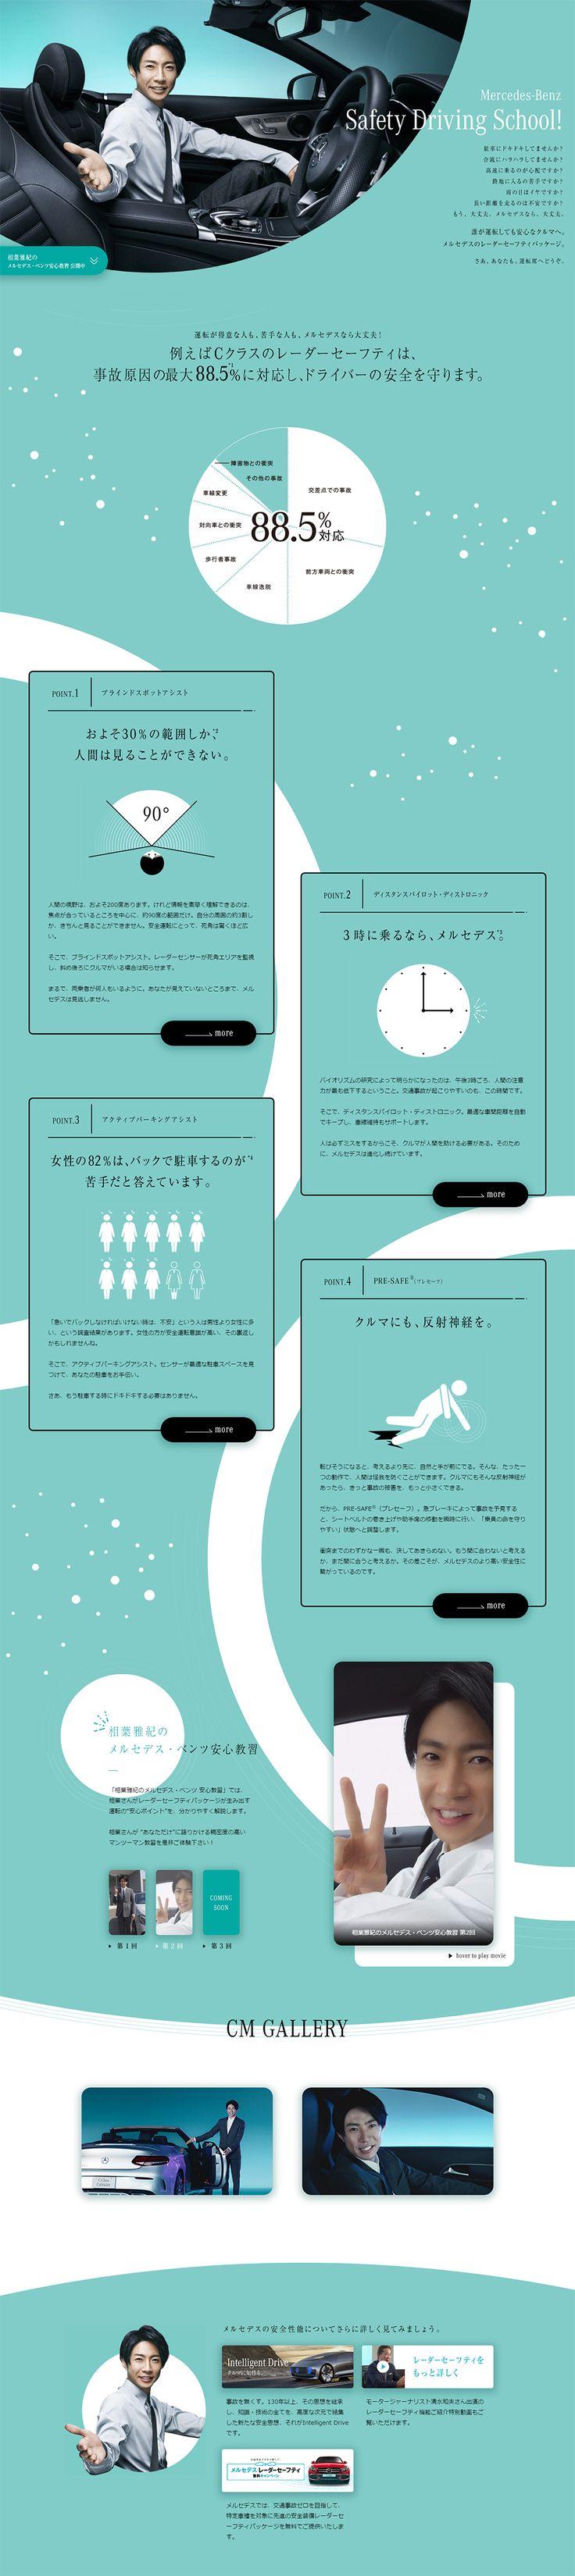 tanabata powerpoint